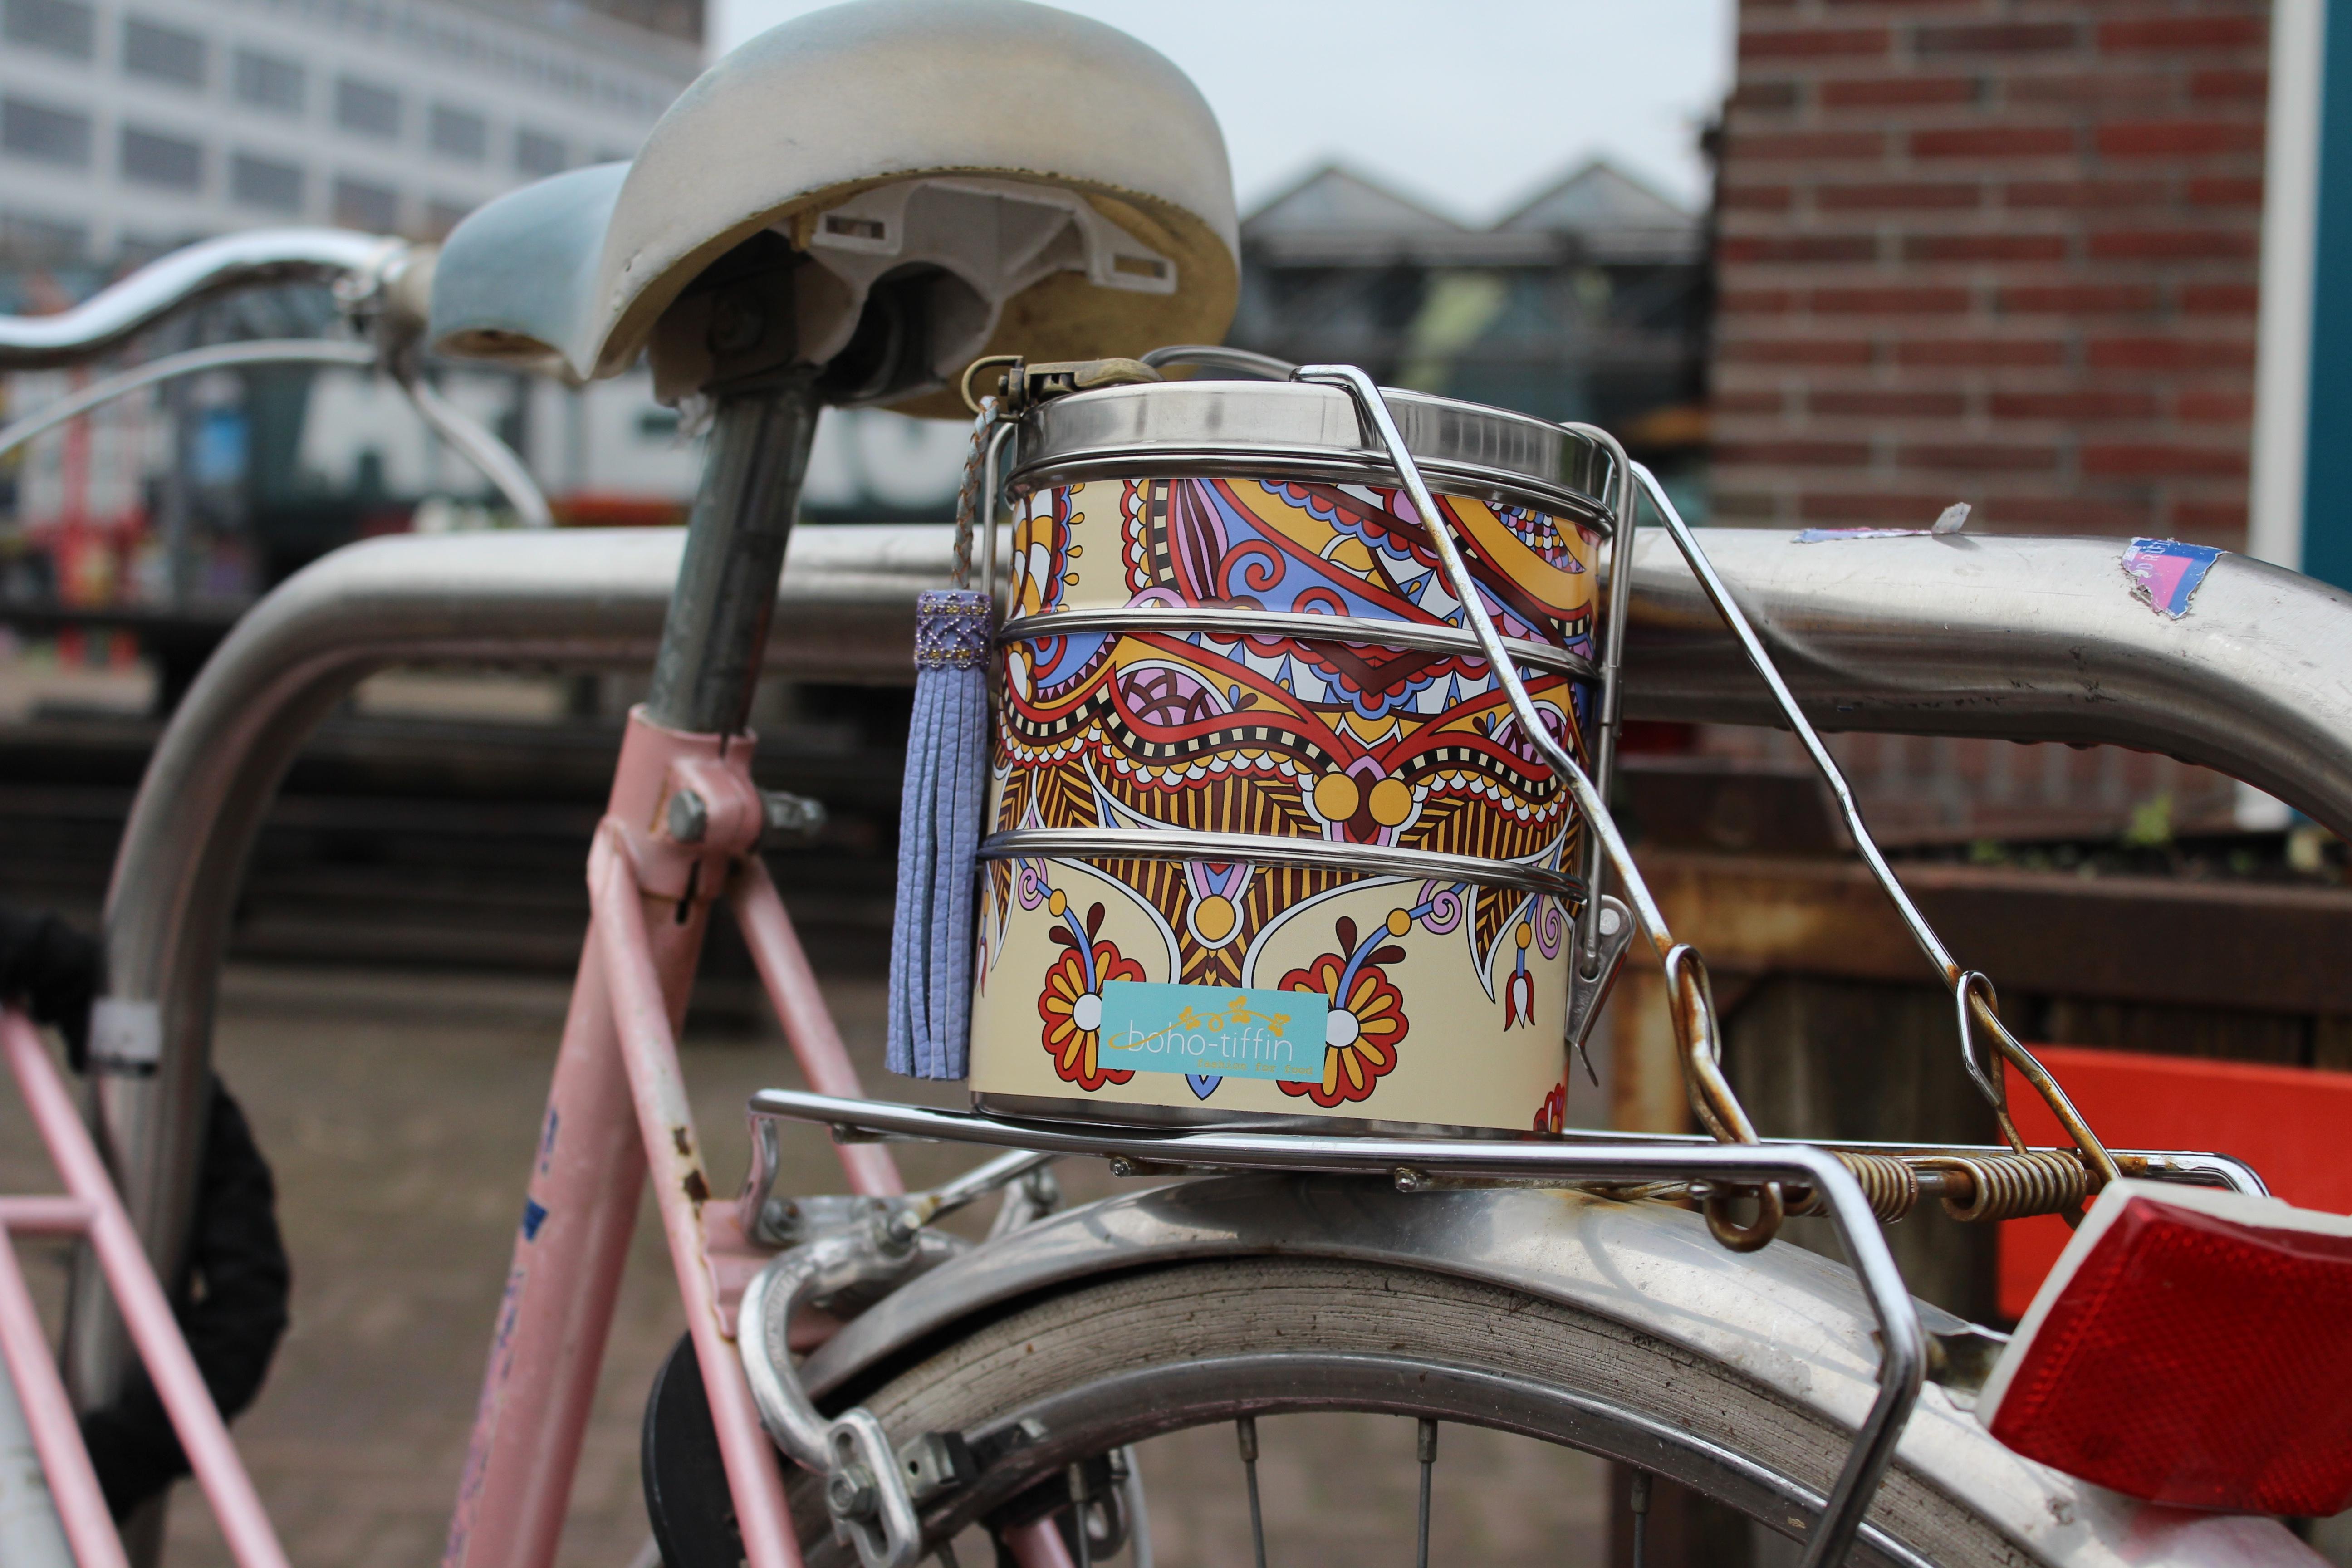 boho-tiffin-fiets